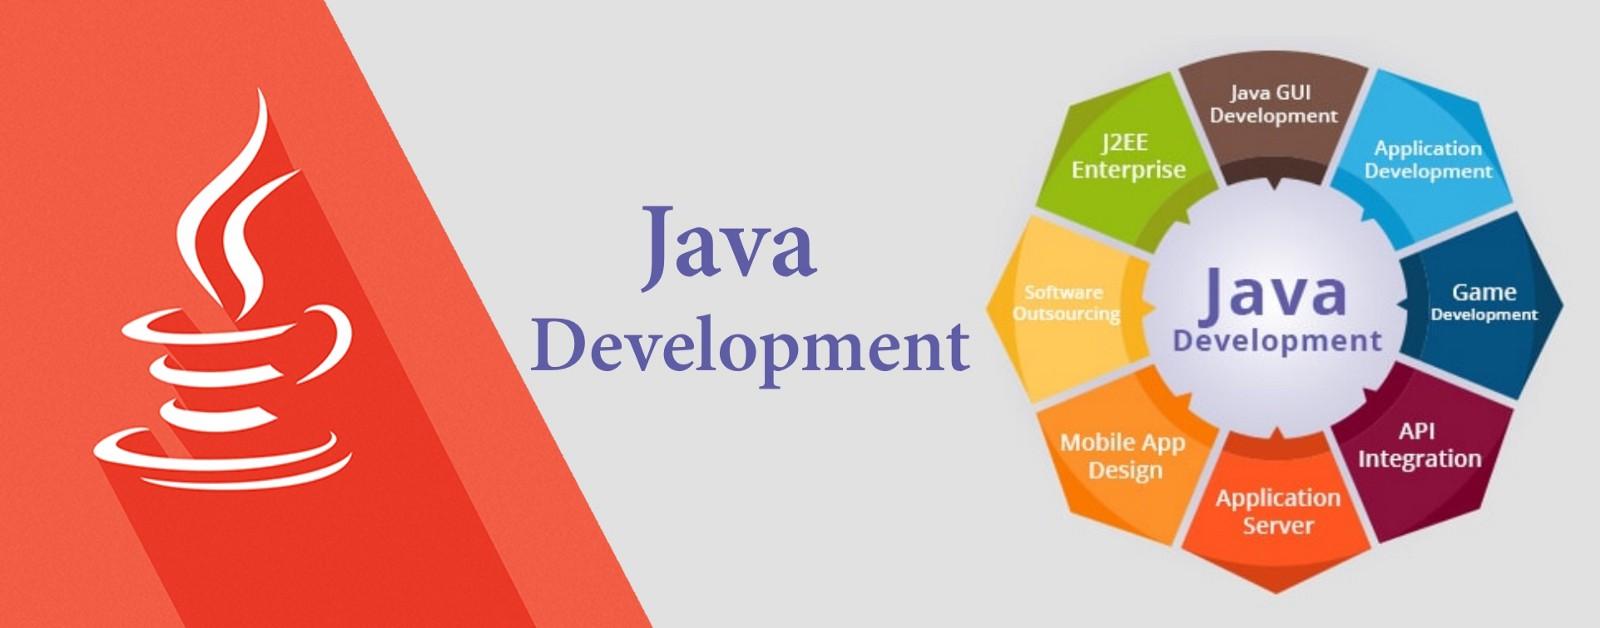 offshore_java_application_development-company